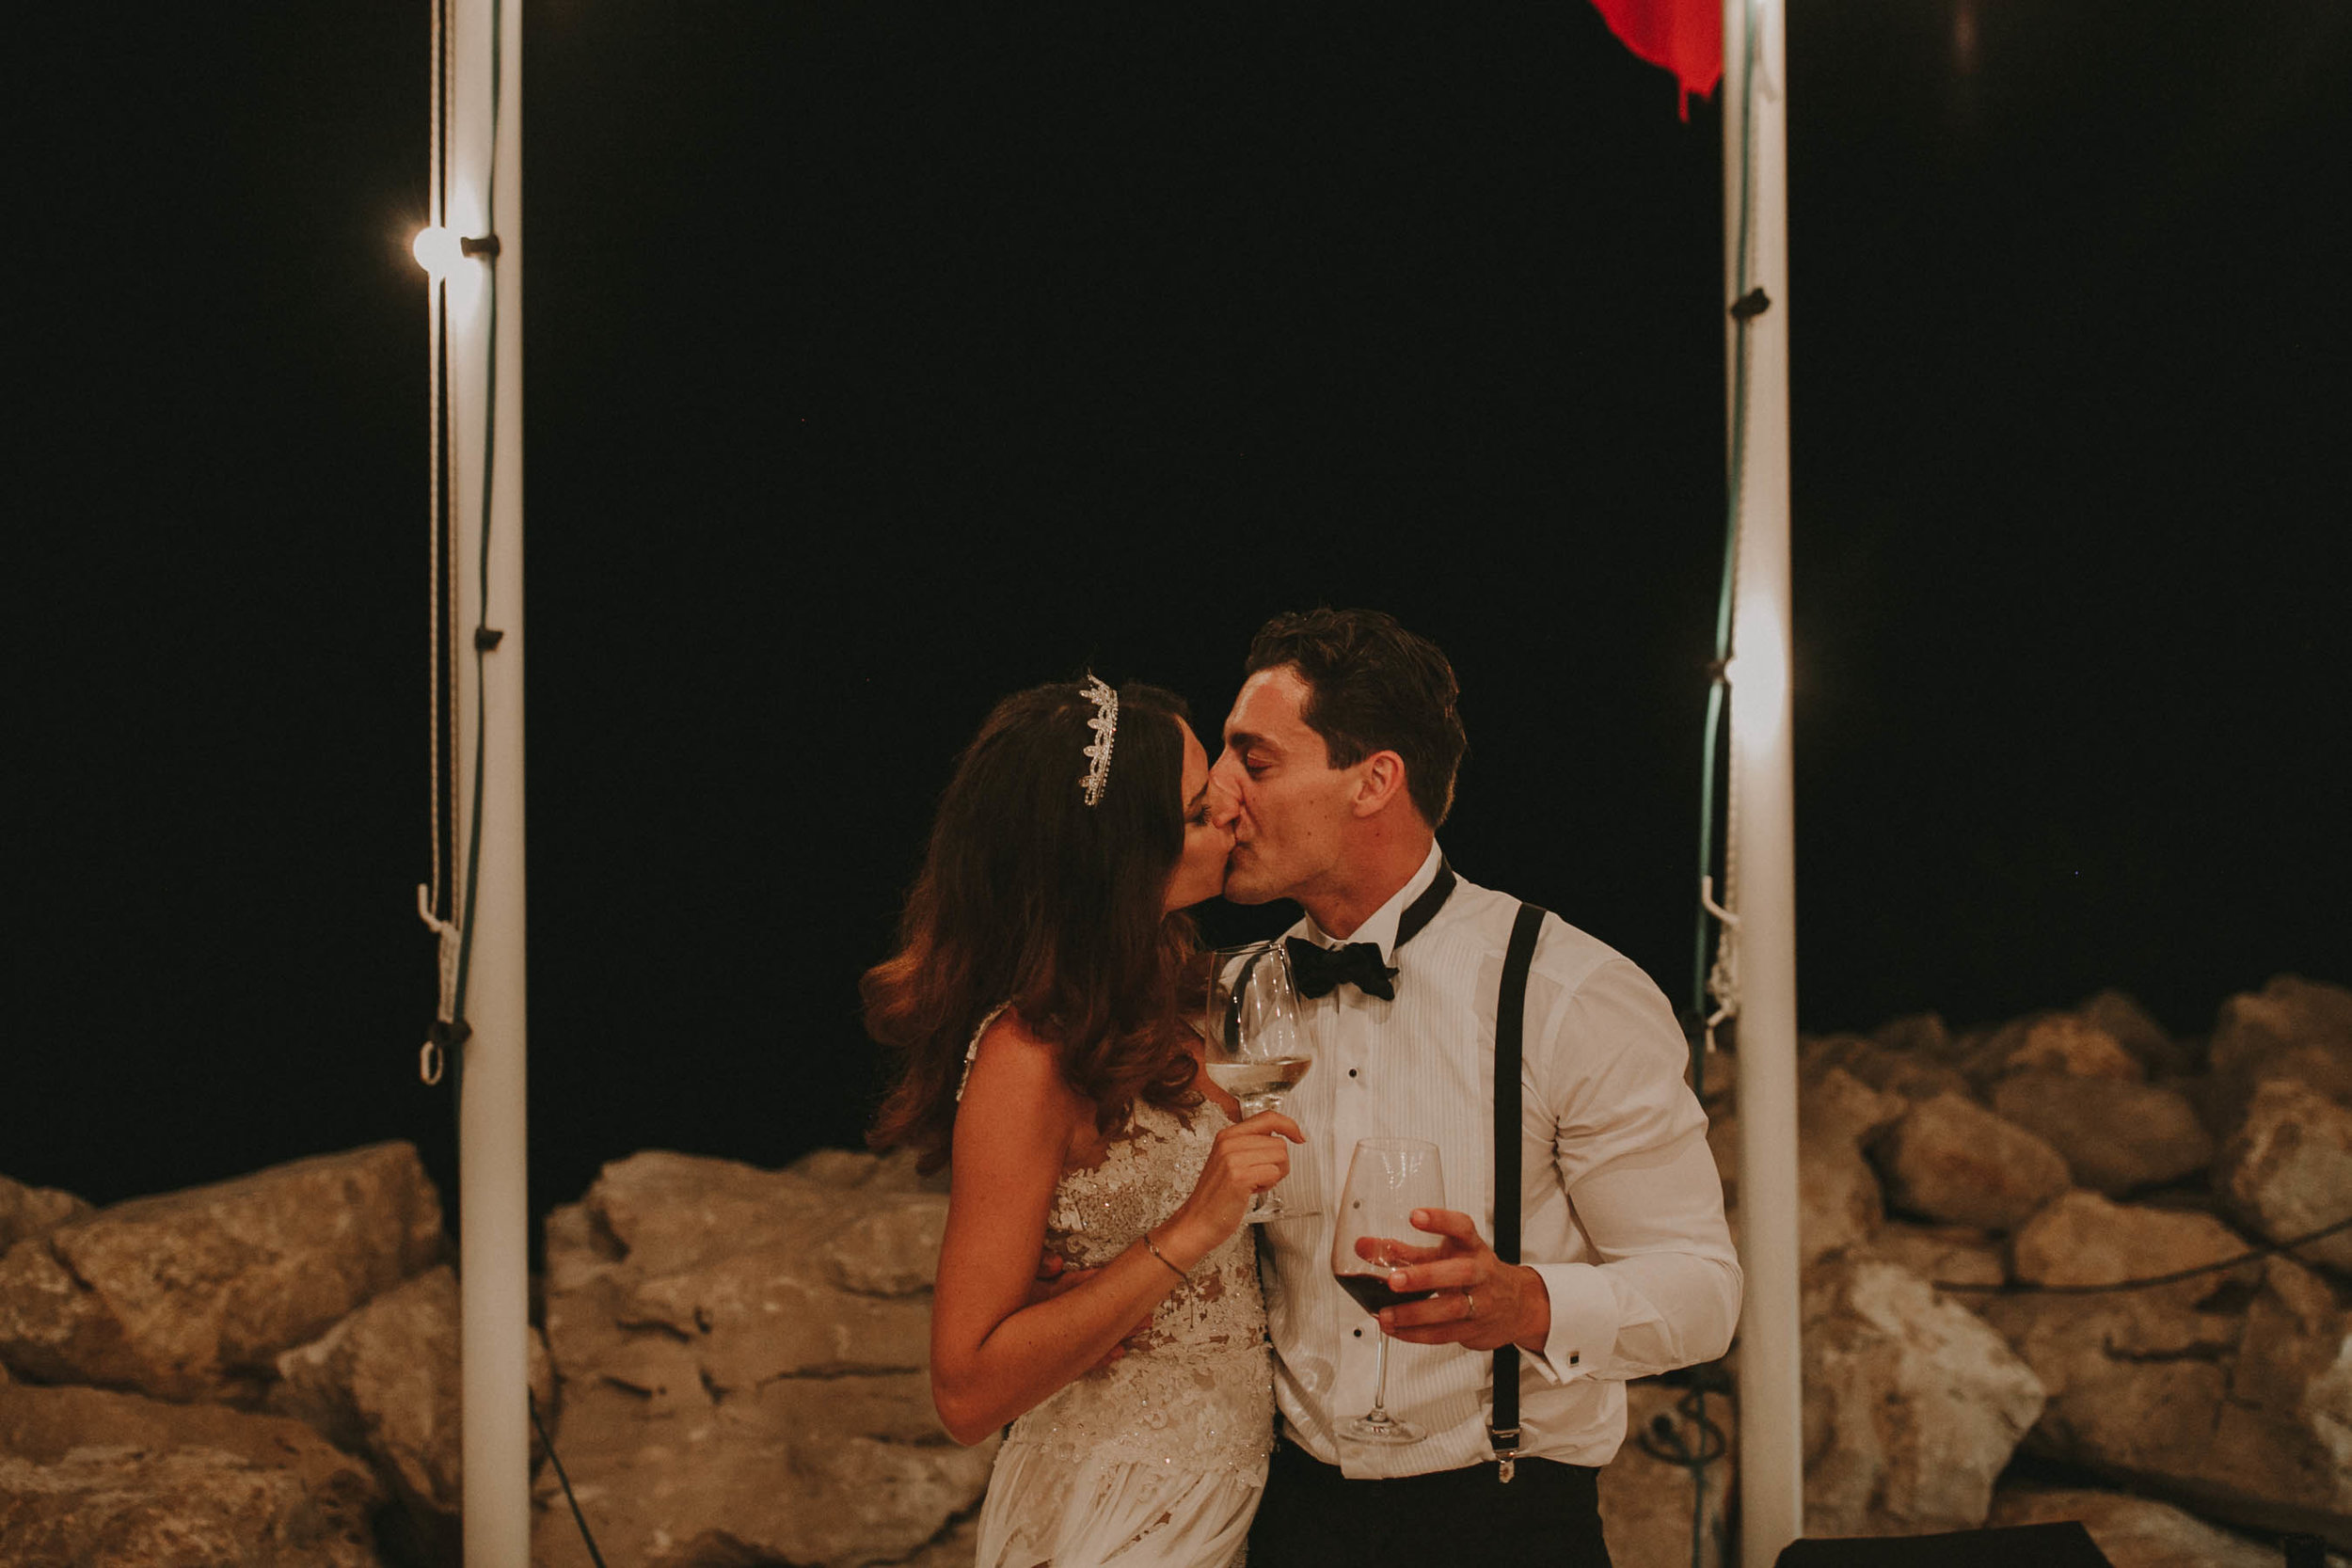 sylvia&dimitri-Wedding-Crvena_Luka-Croatia-113(6920).jpg